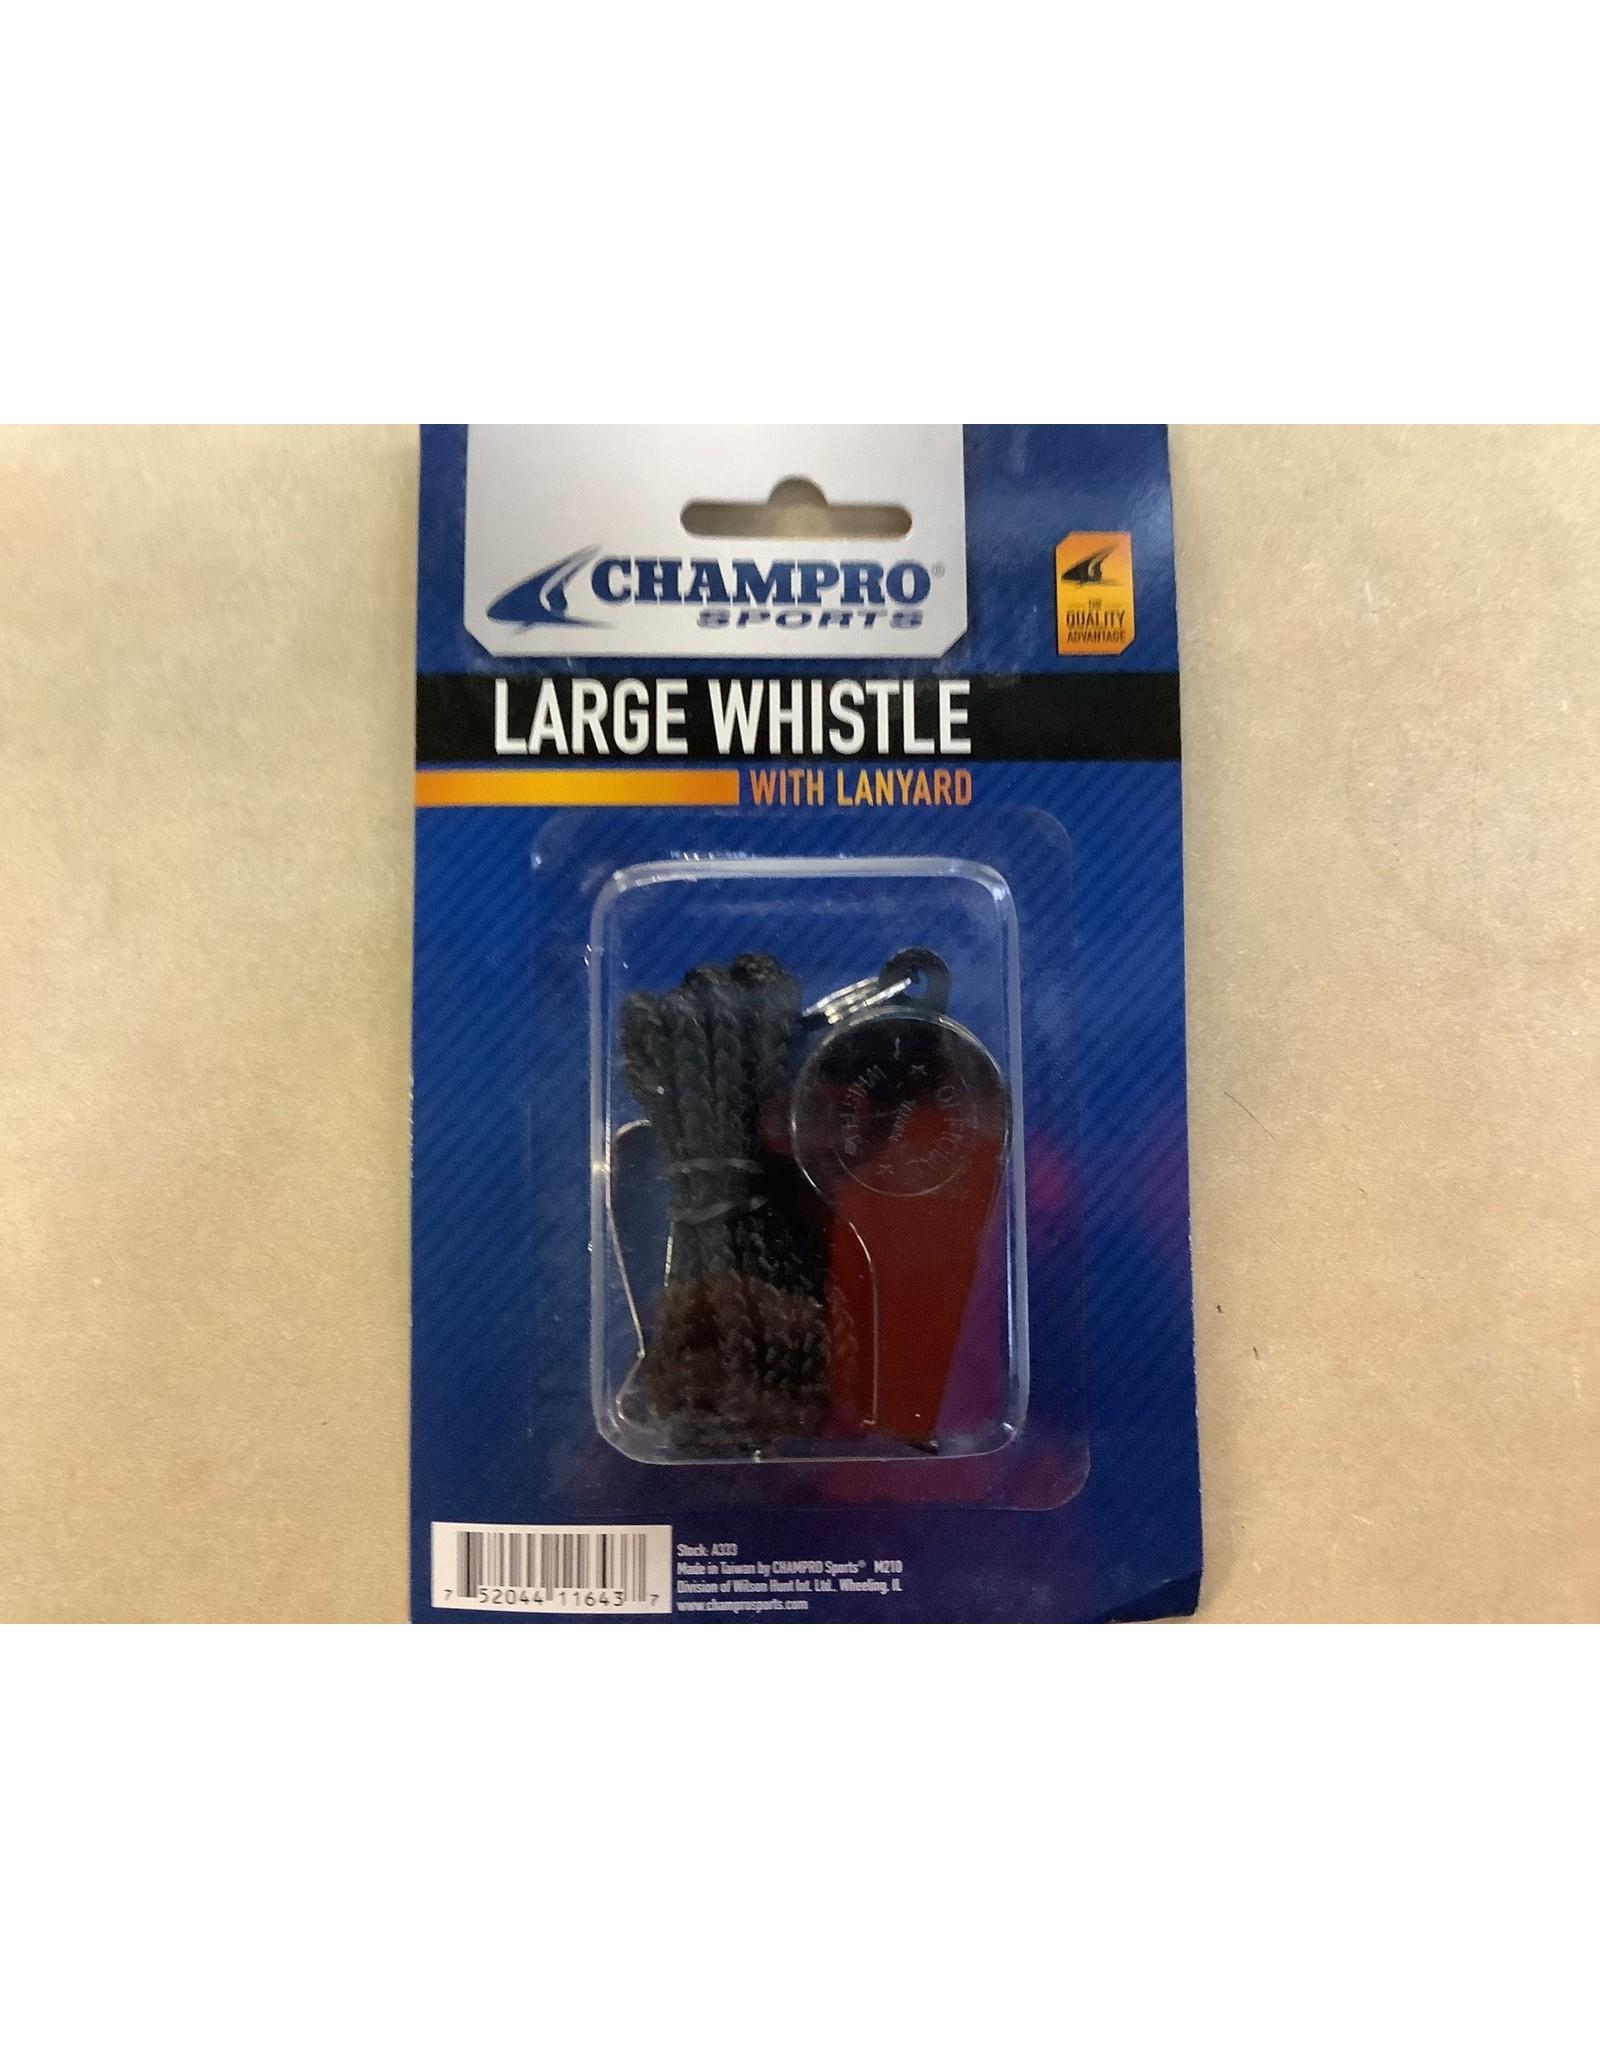 Champro Large Whistle w/ Lanyard Plastic